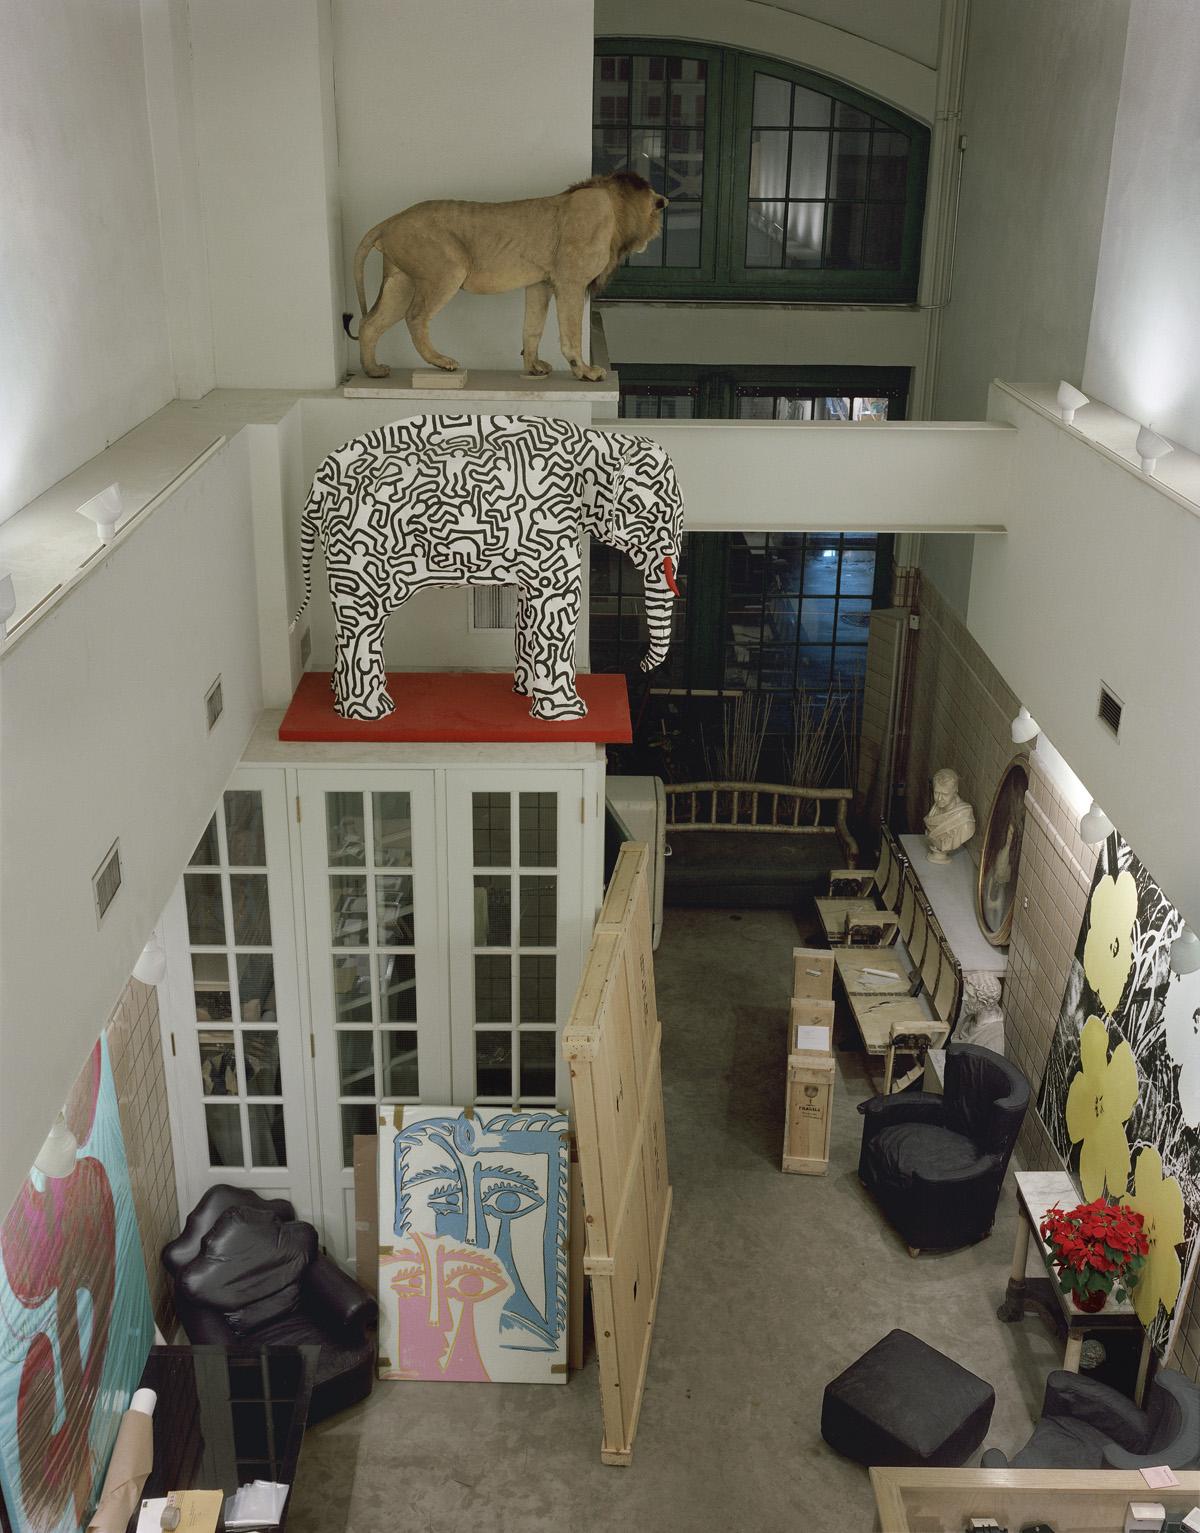 Andy Warhol Factory - 34th & Madison, NY